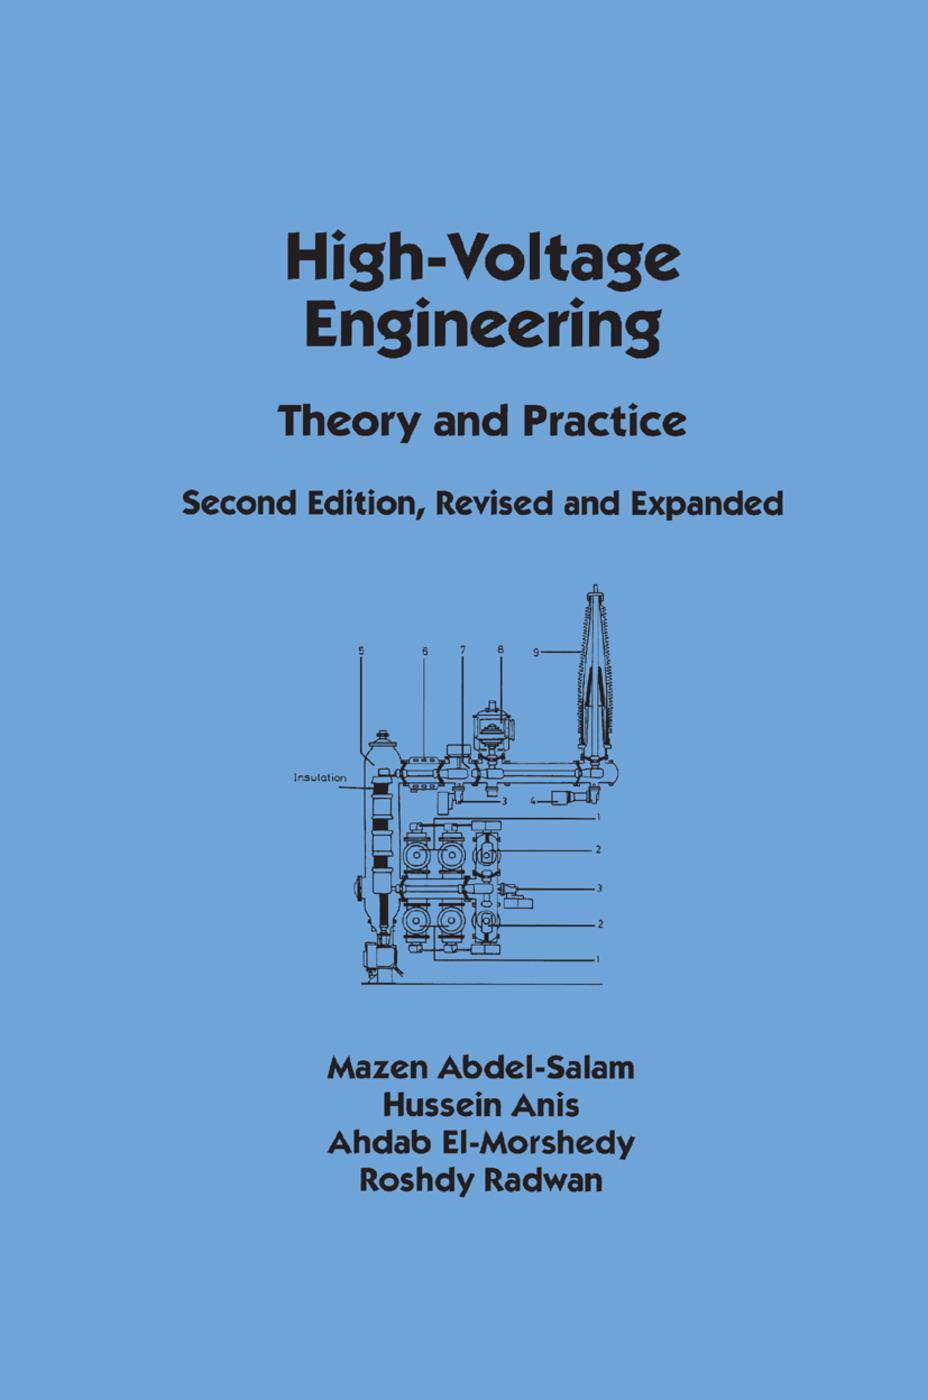 High-Voltage Engineering